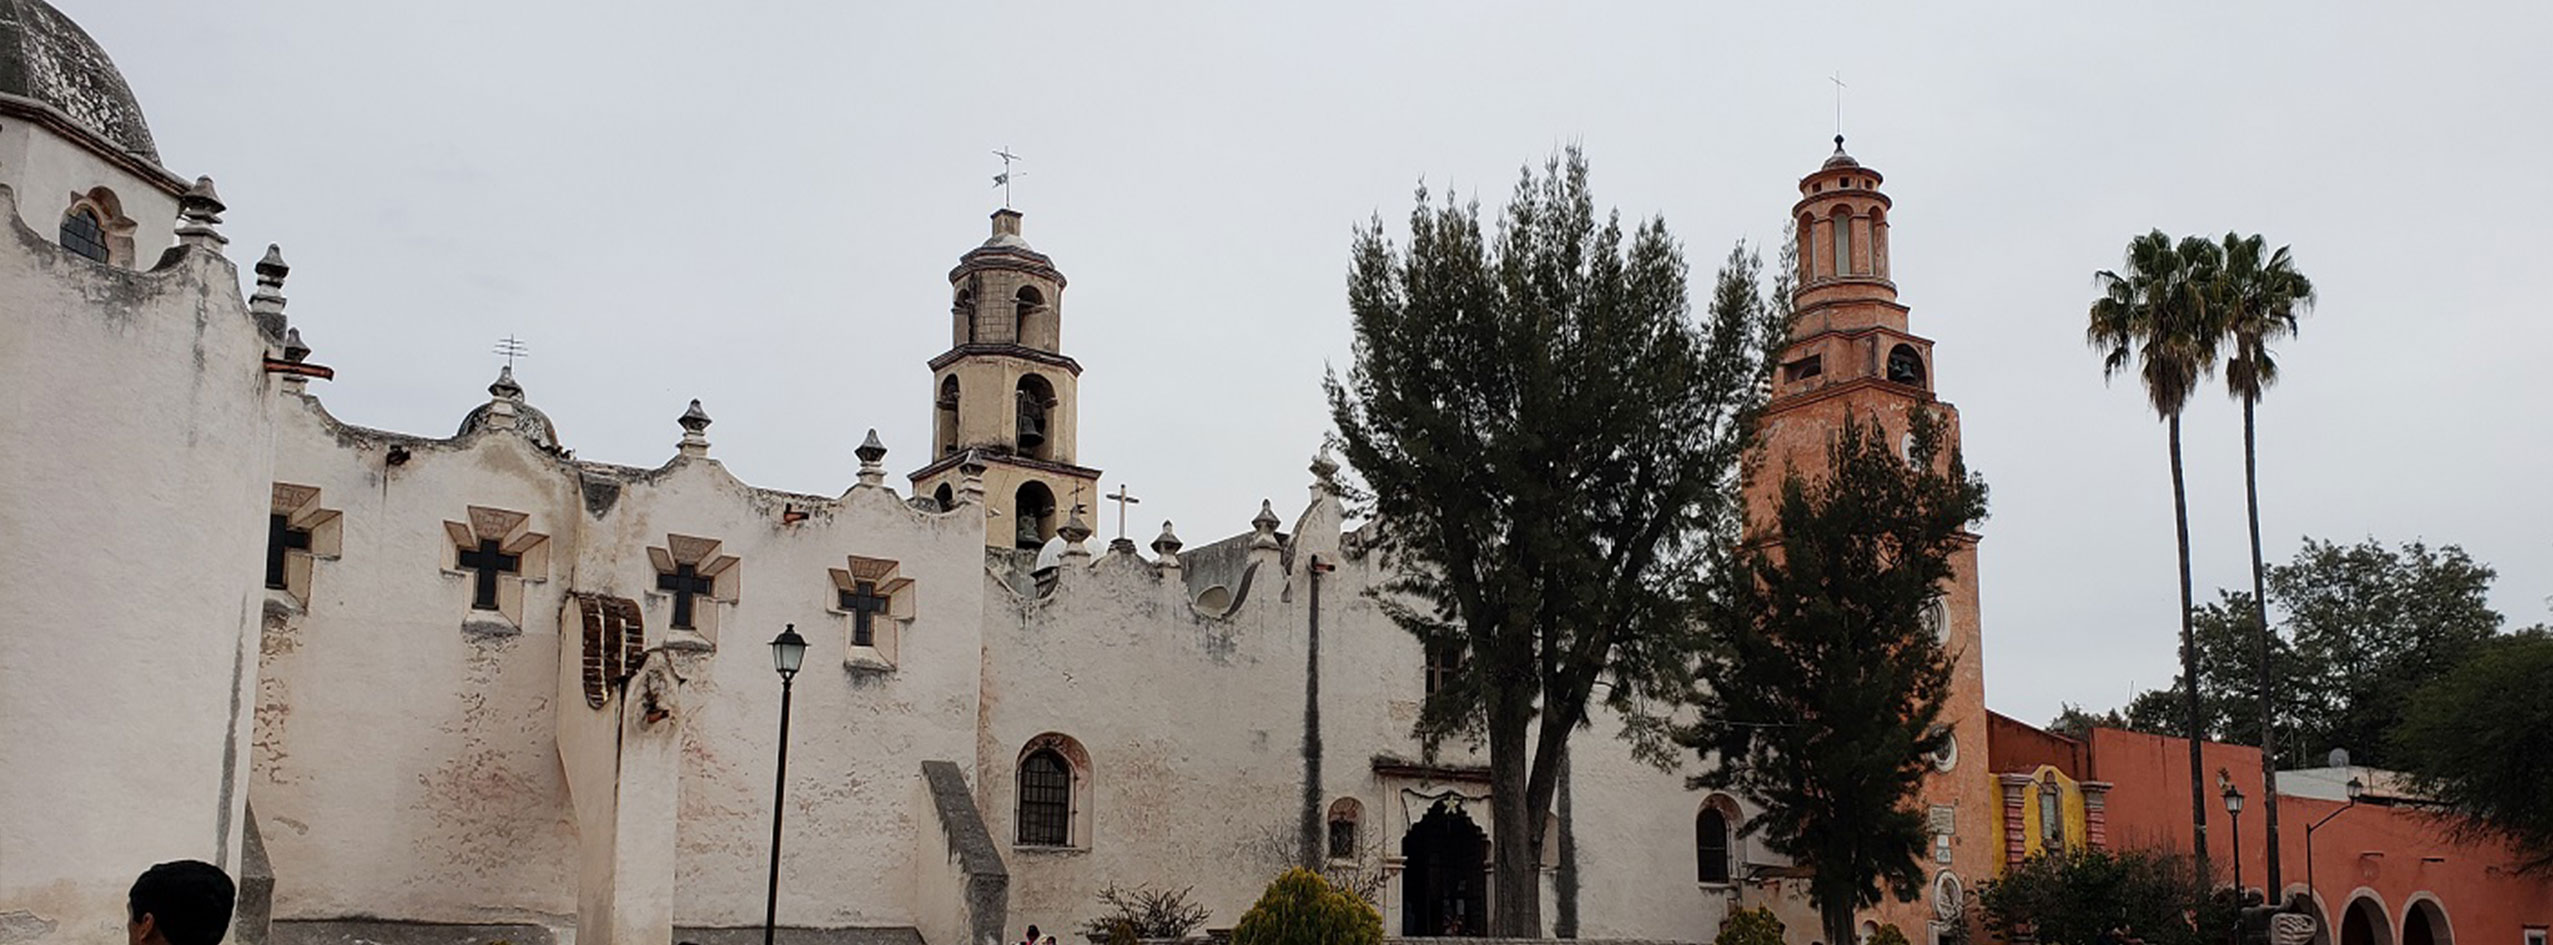 La Capilla Sixtina Mexicana / Santuario Jesus Nazareno de Atotonilco